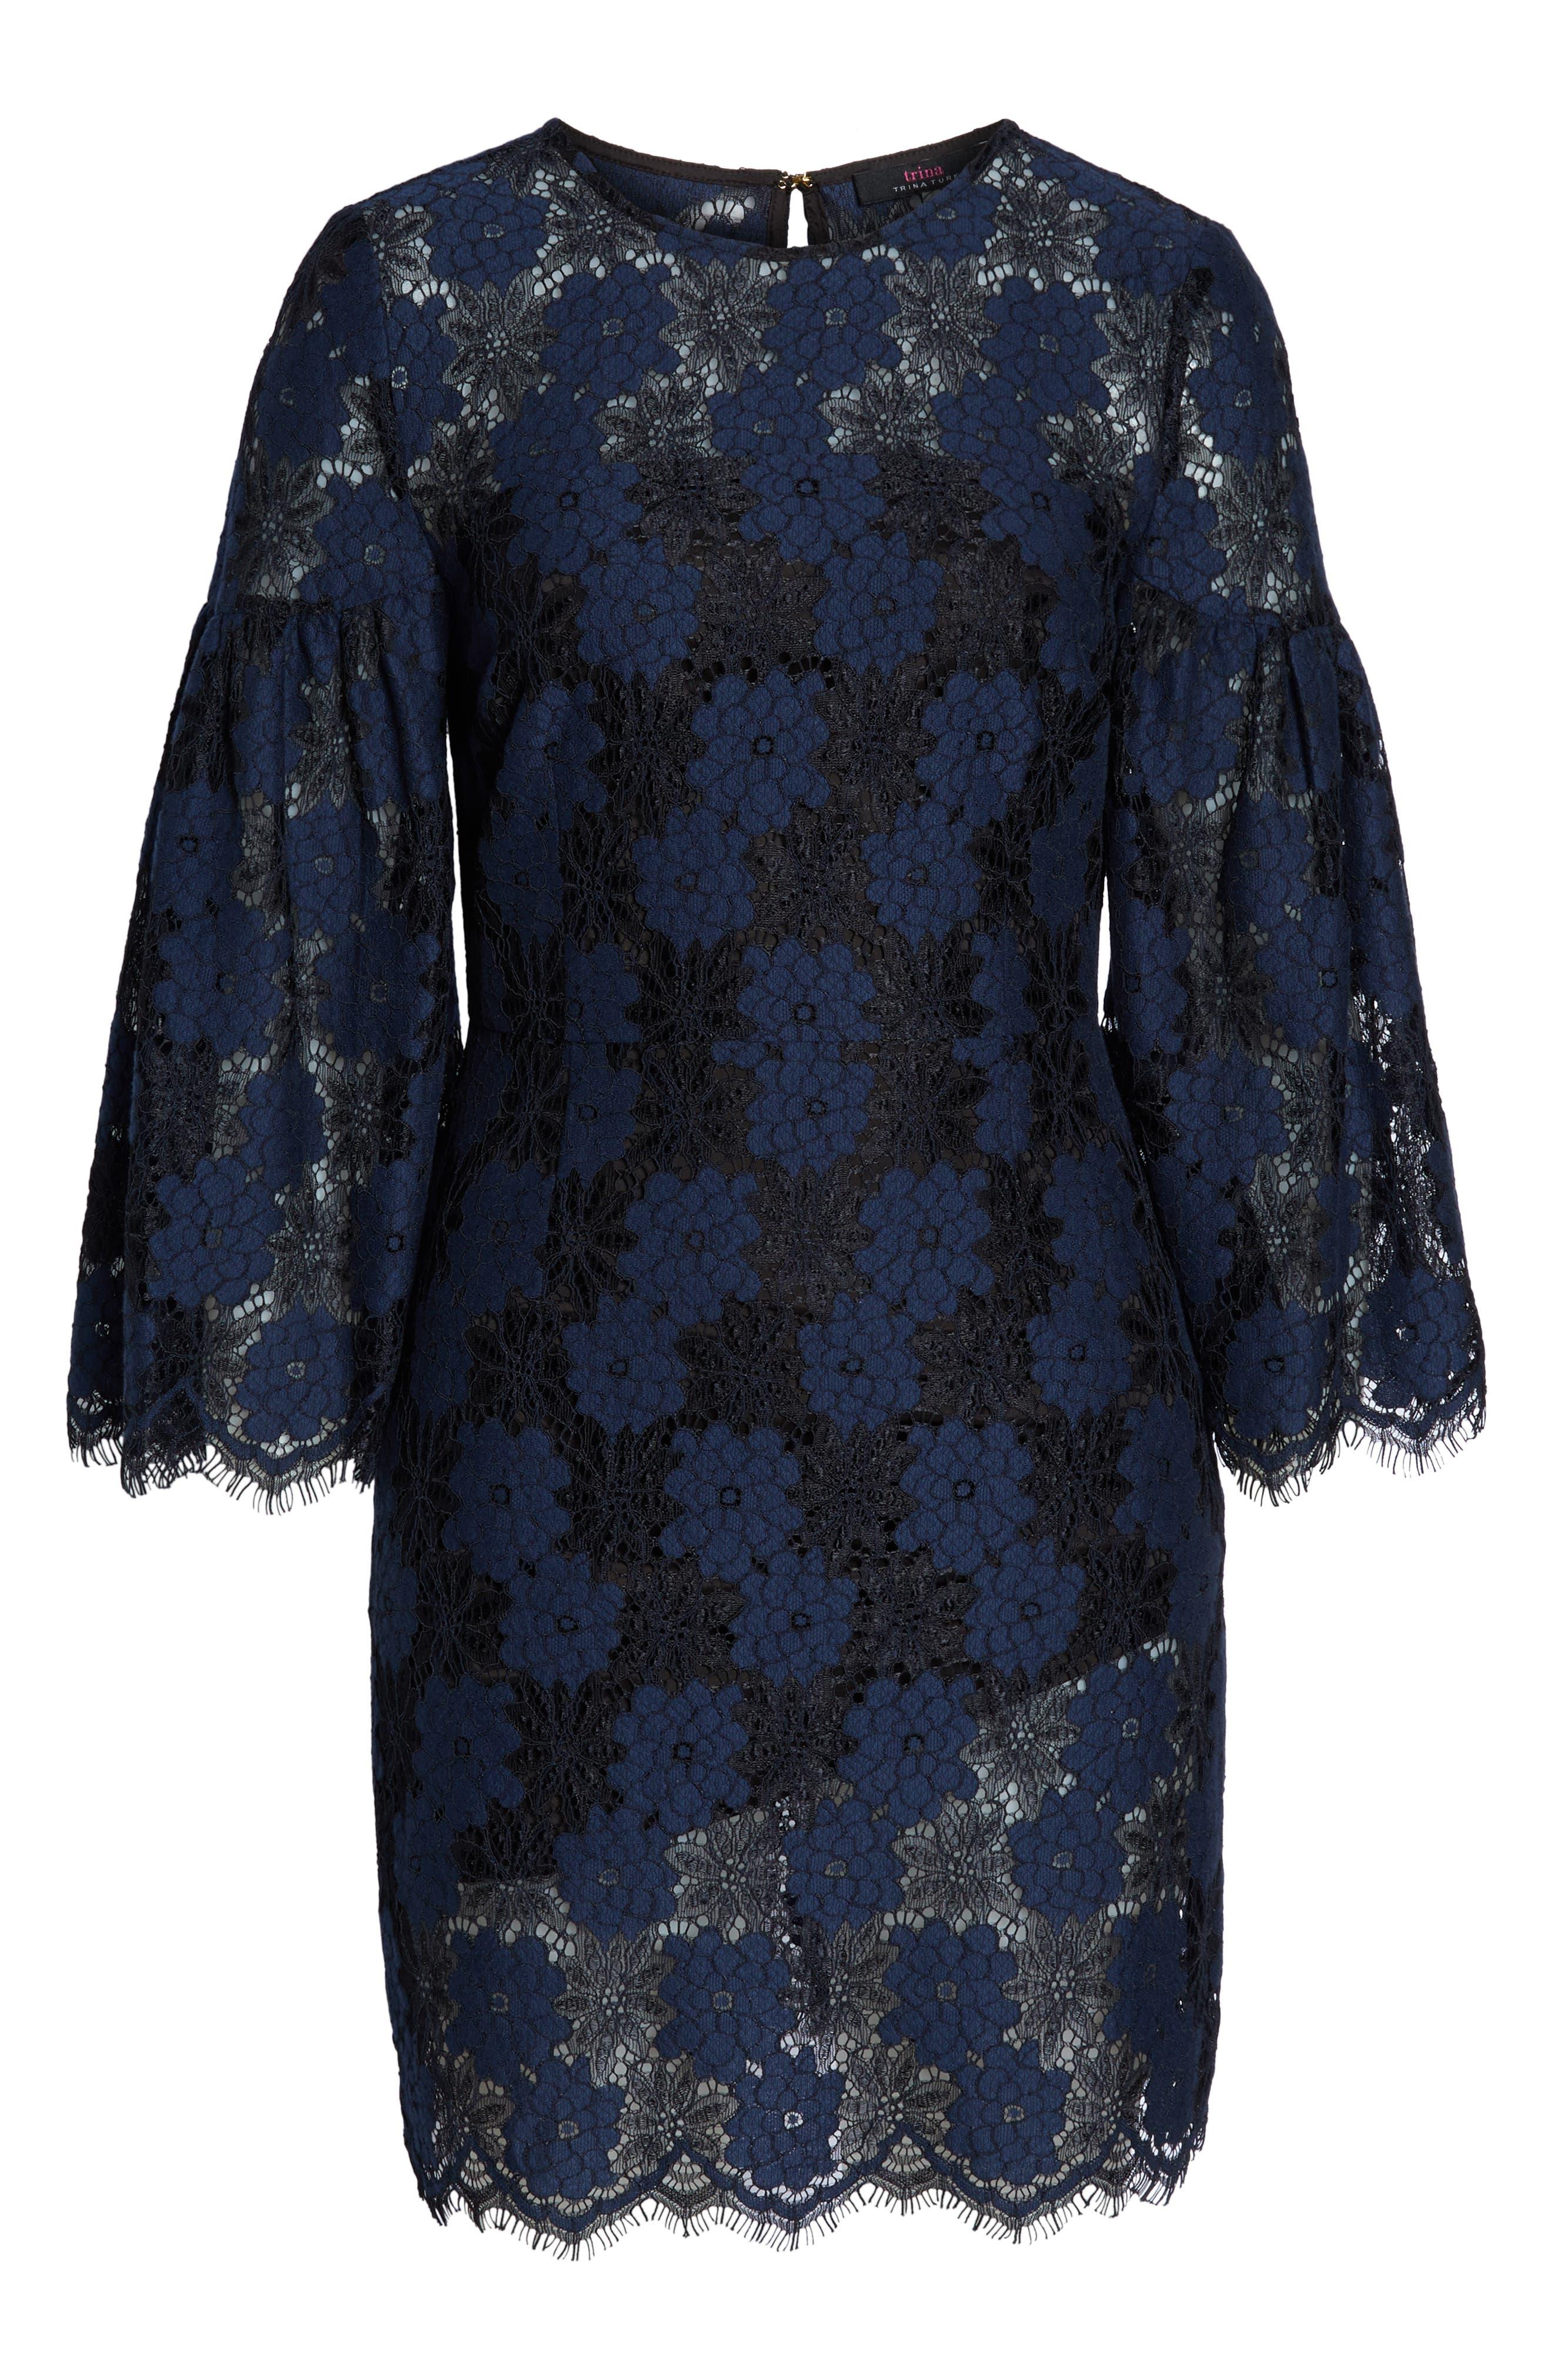 Two-Tone Lace Shift Dress,                             Alternate thumbnail 6, color,                             BLACK/ BLUE FLOWER